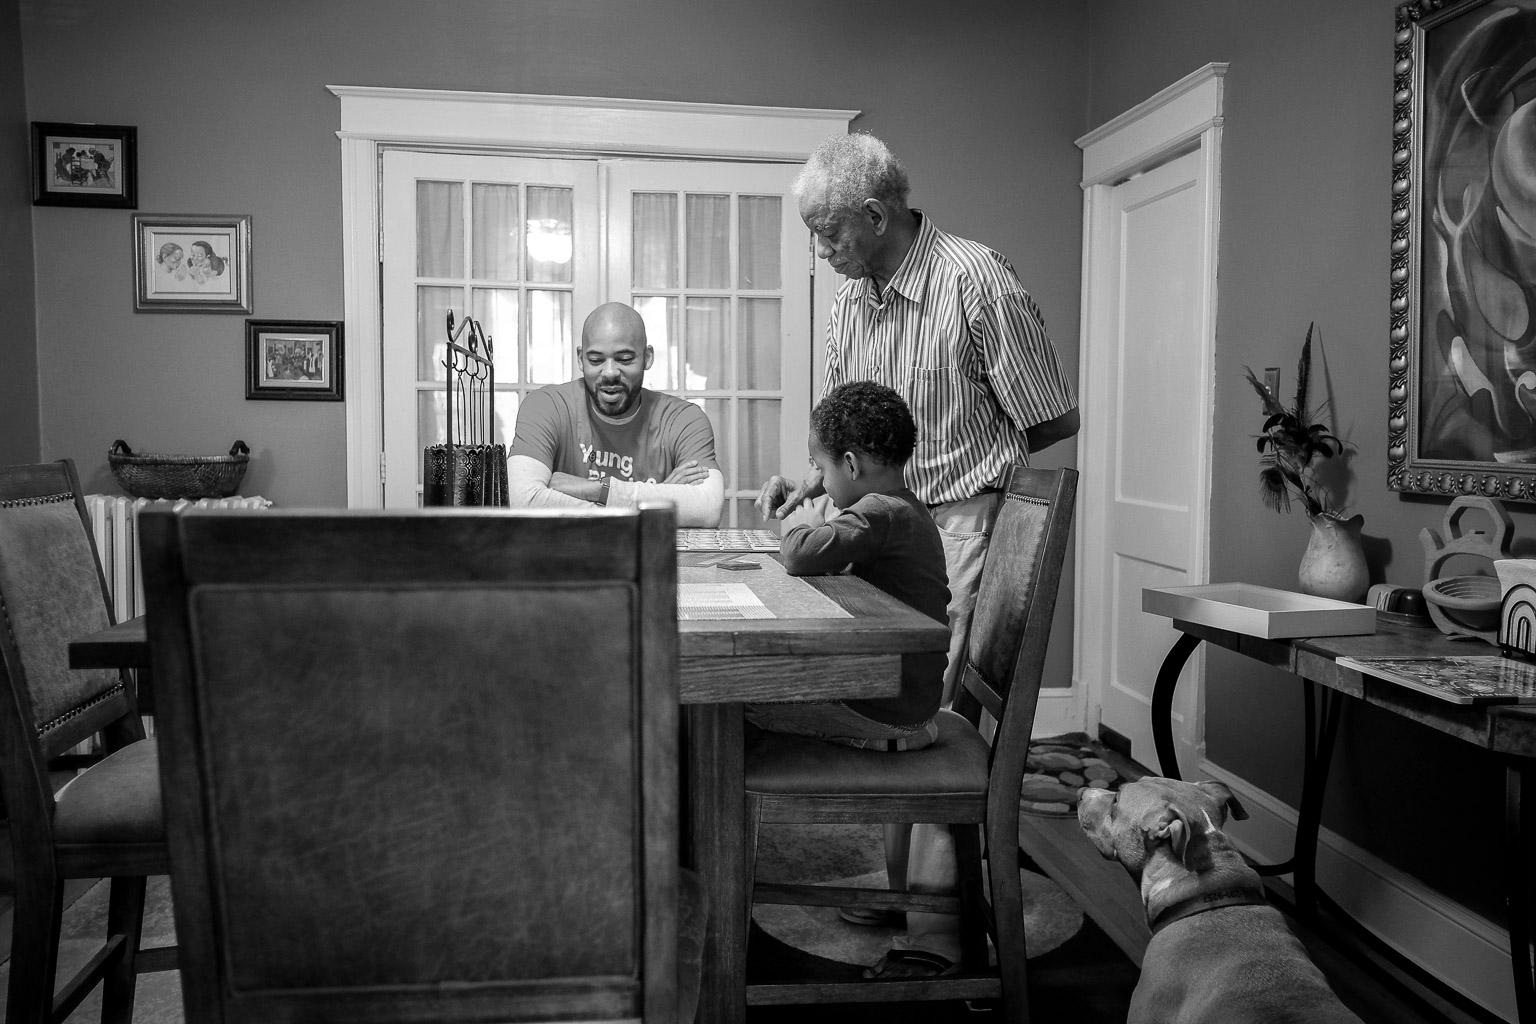 Lenzy_Ruffin_Photography_Family_Portrait_Photographer_Washington_DC_4-8-17-052.jpg